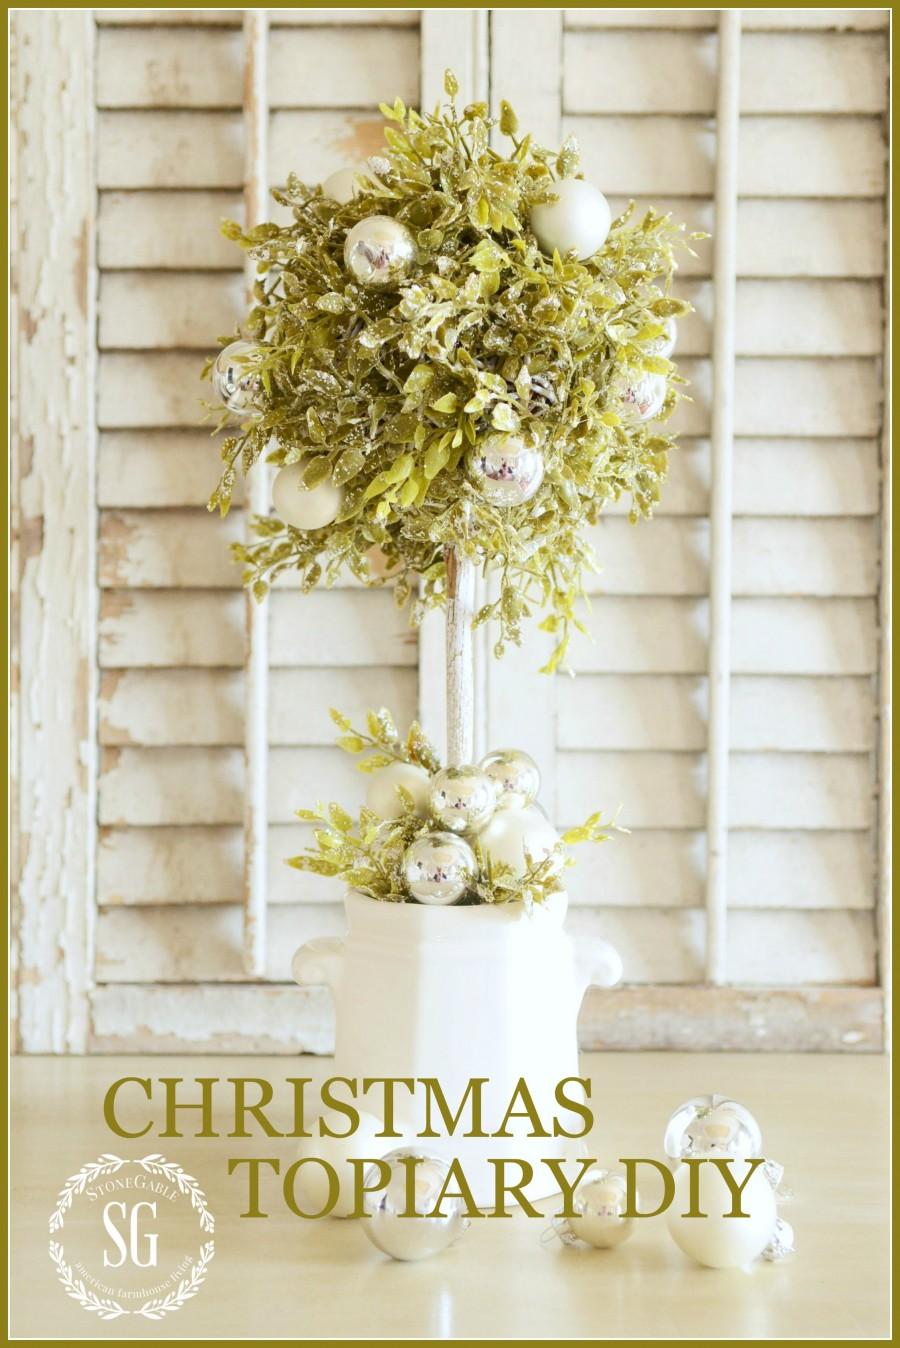 CHRISTMAS TOPIARY DIY-stonegableblog.com